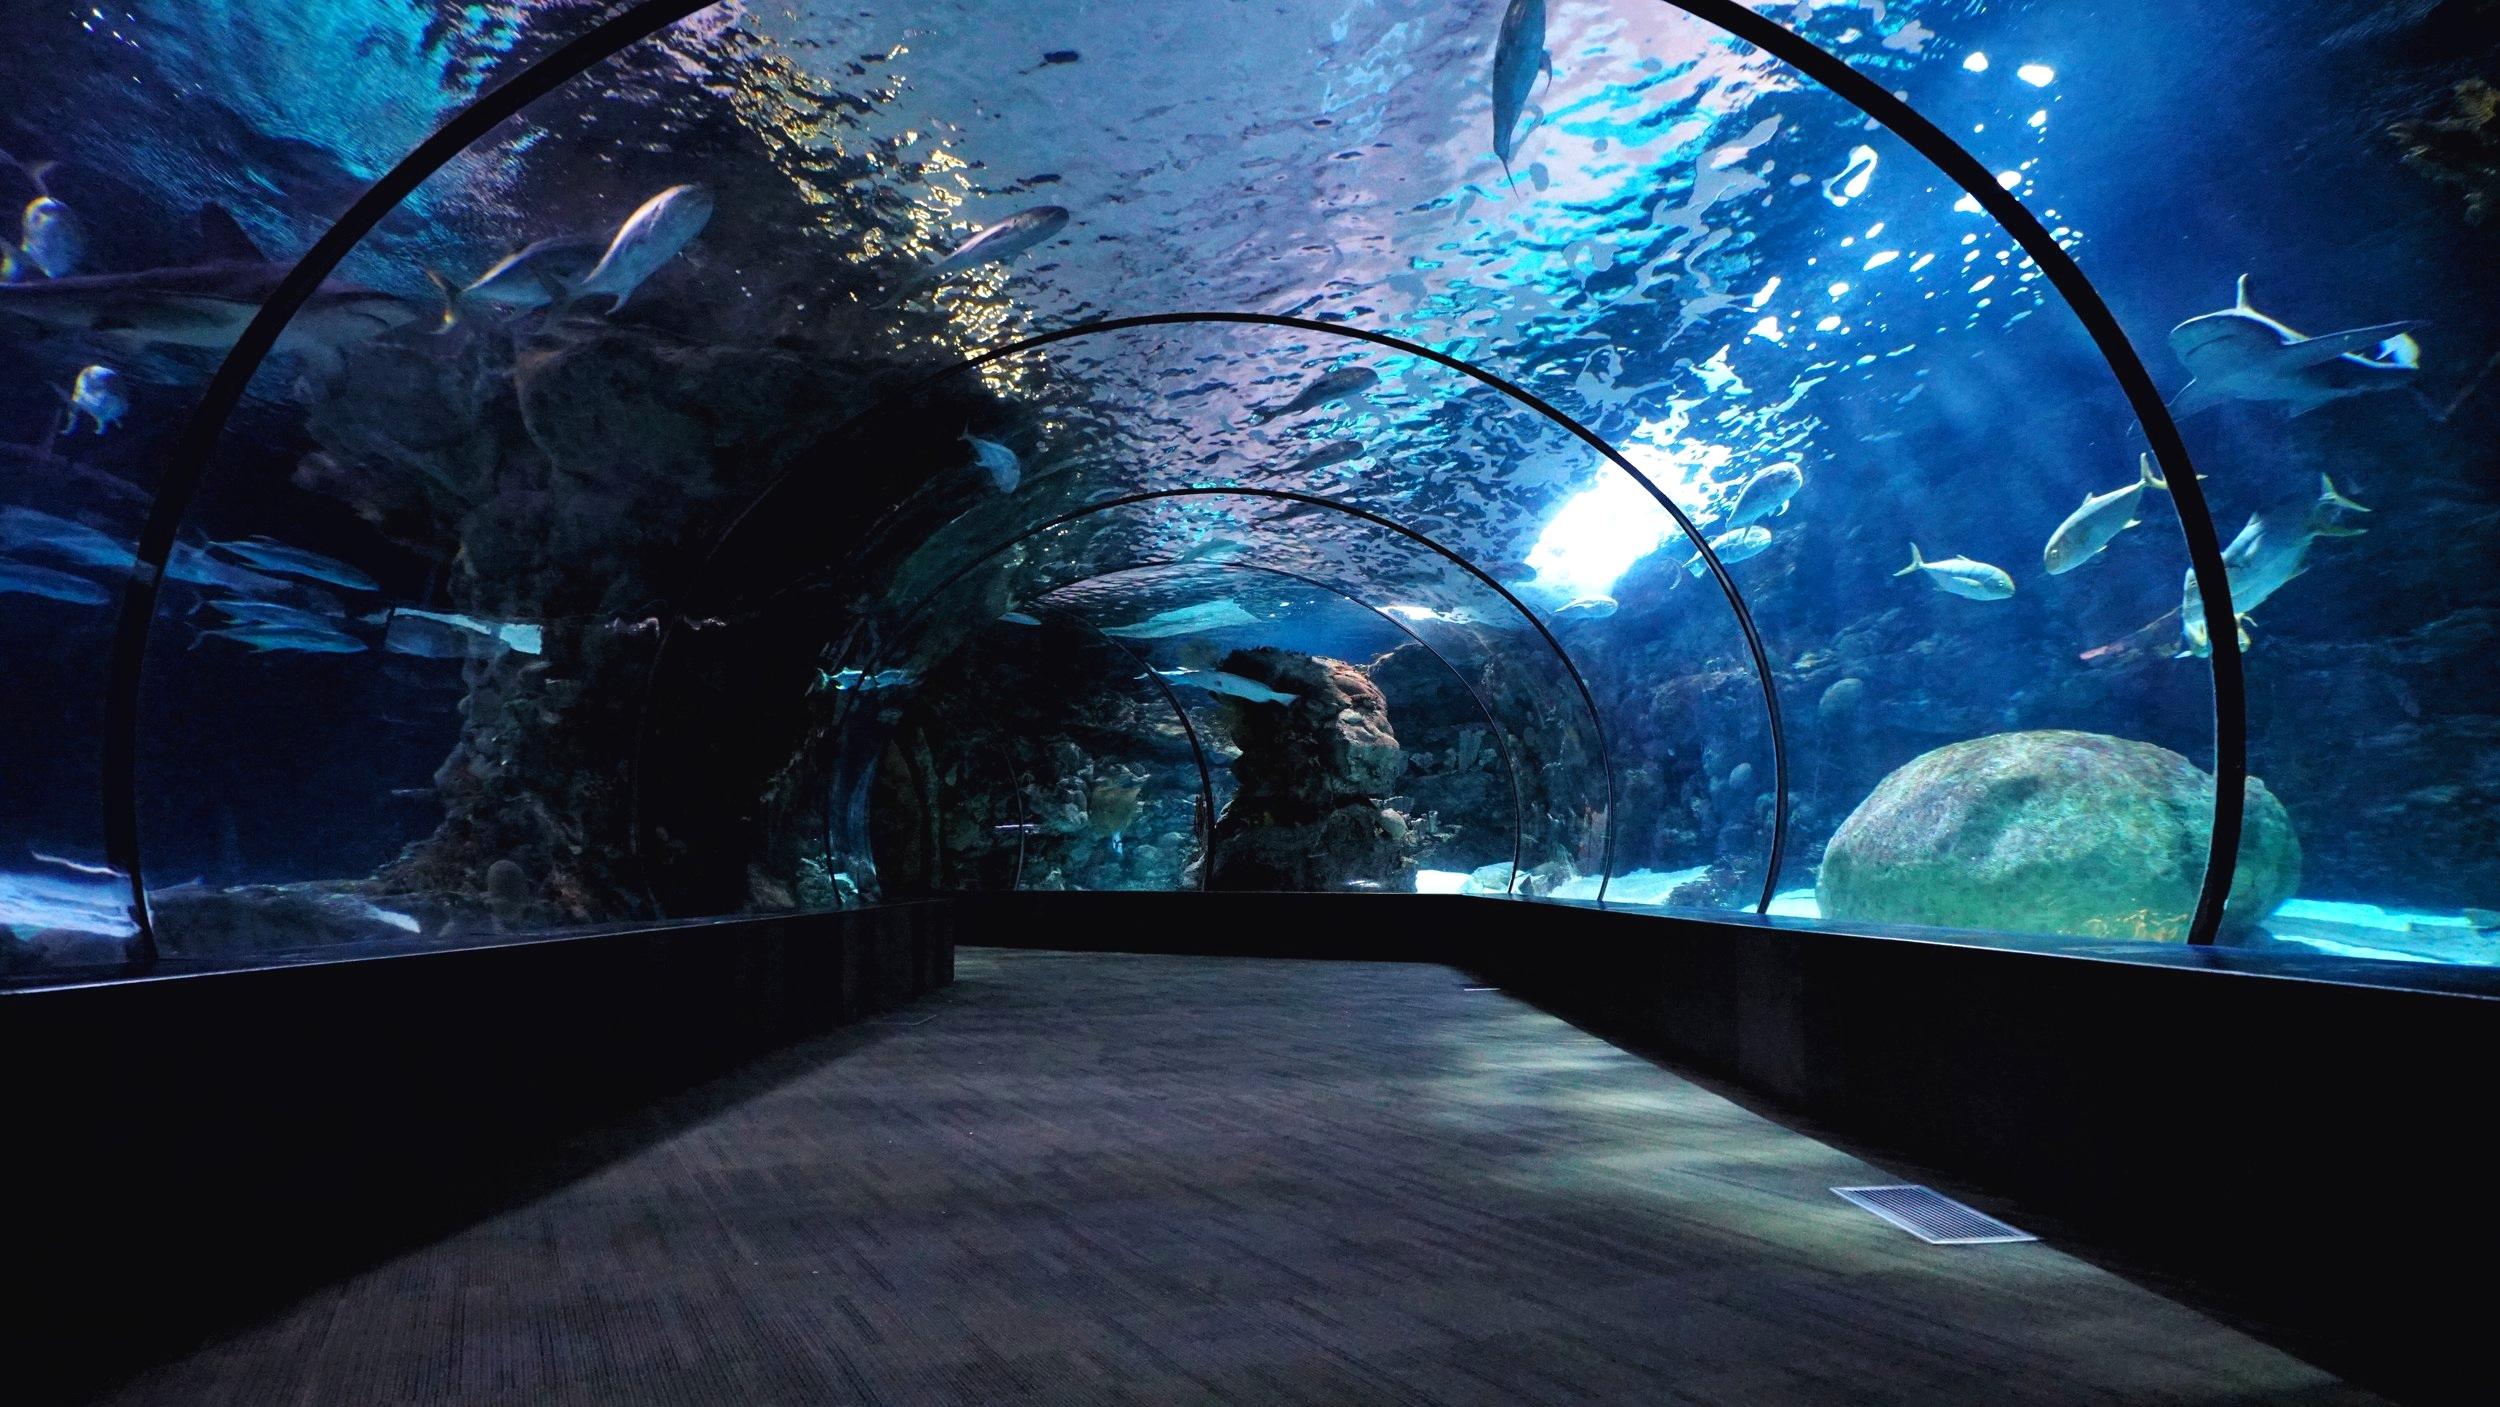 Ripley's Aquarium, Ontario, Canada